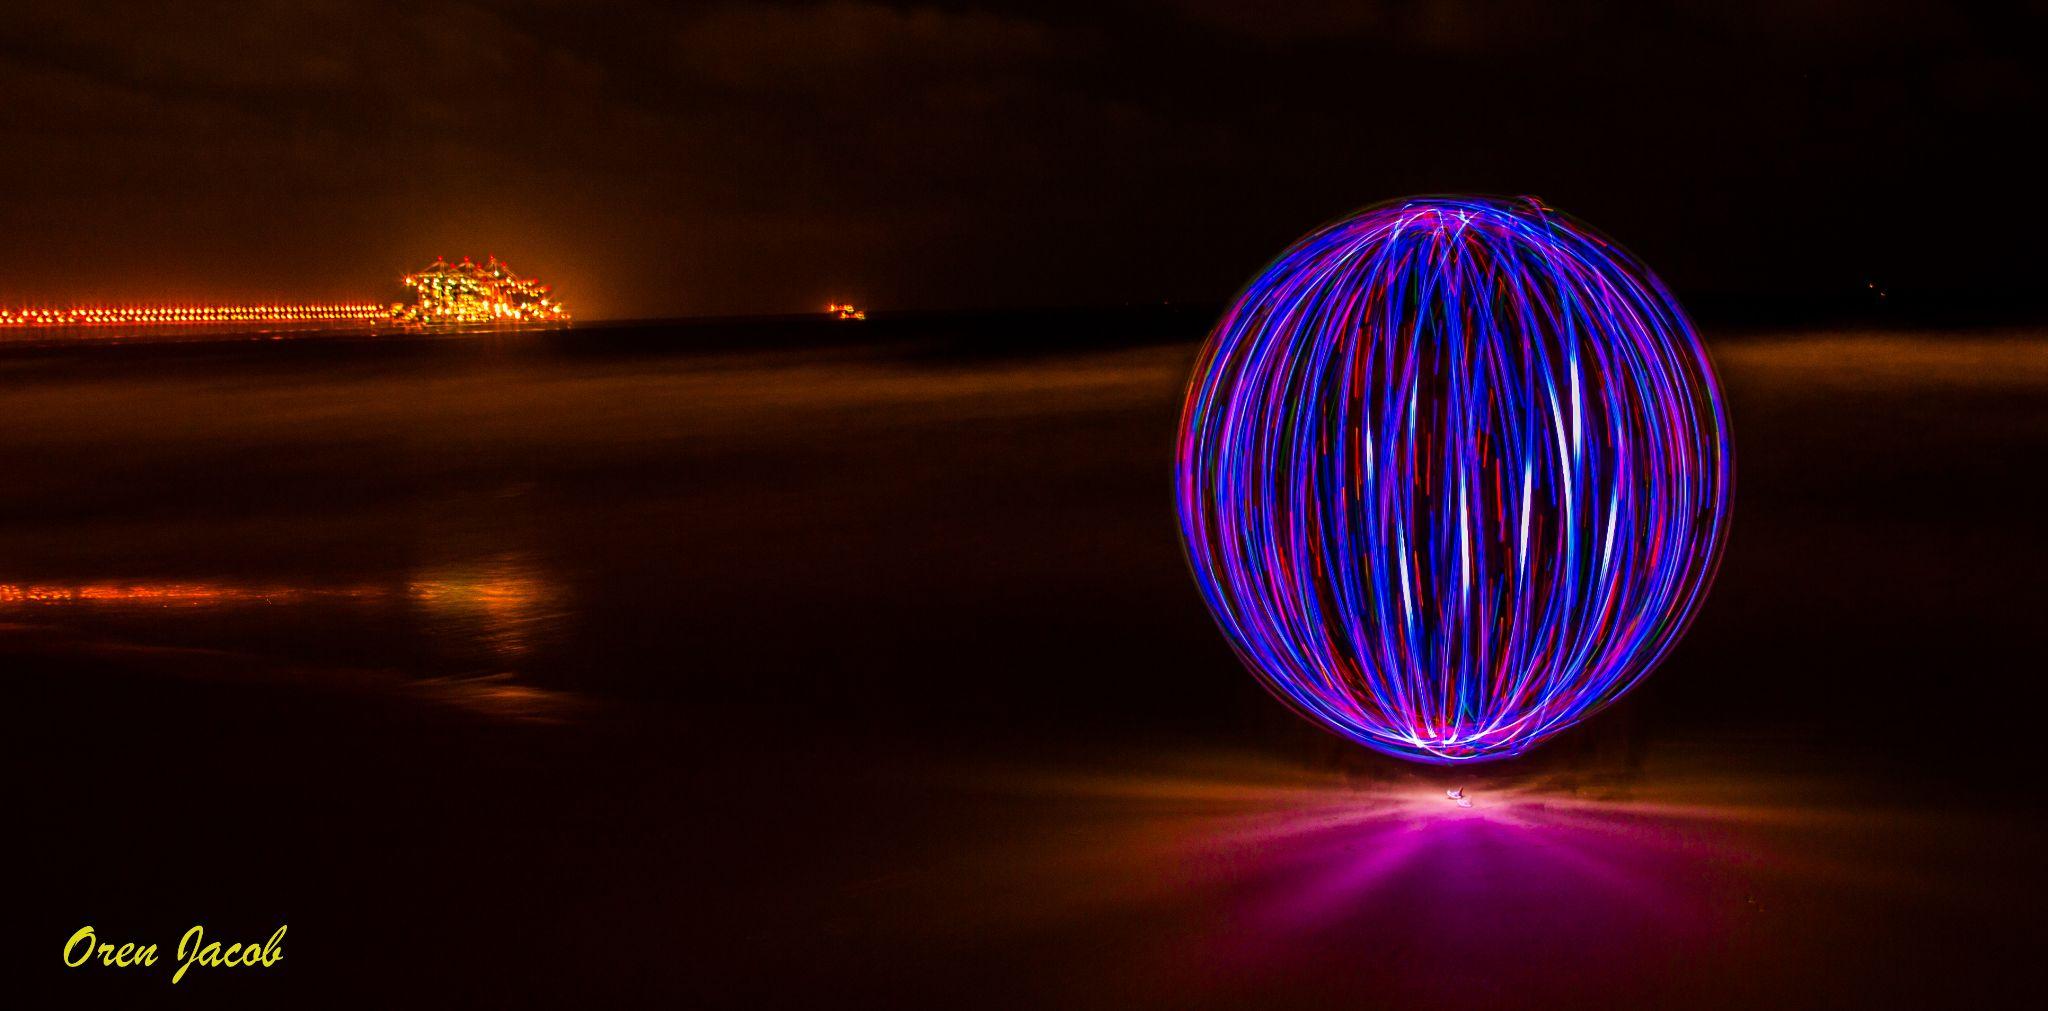 Lighting - Dor Beach - Israel by oren.yacob